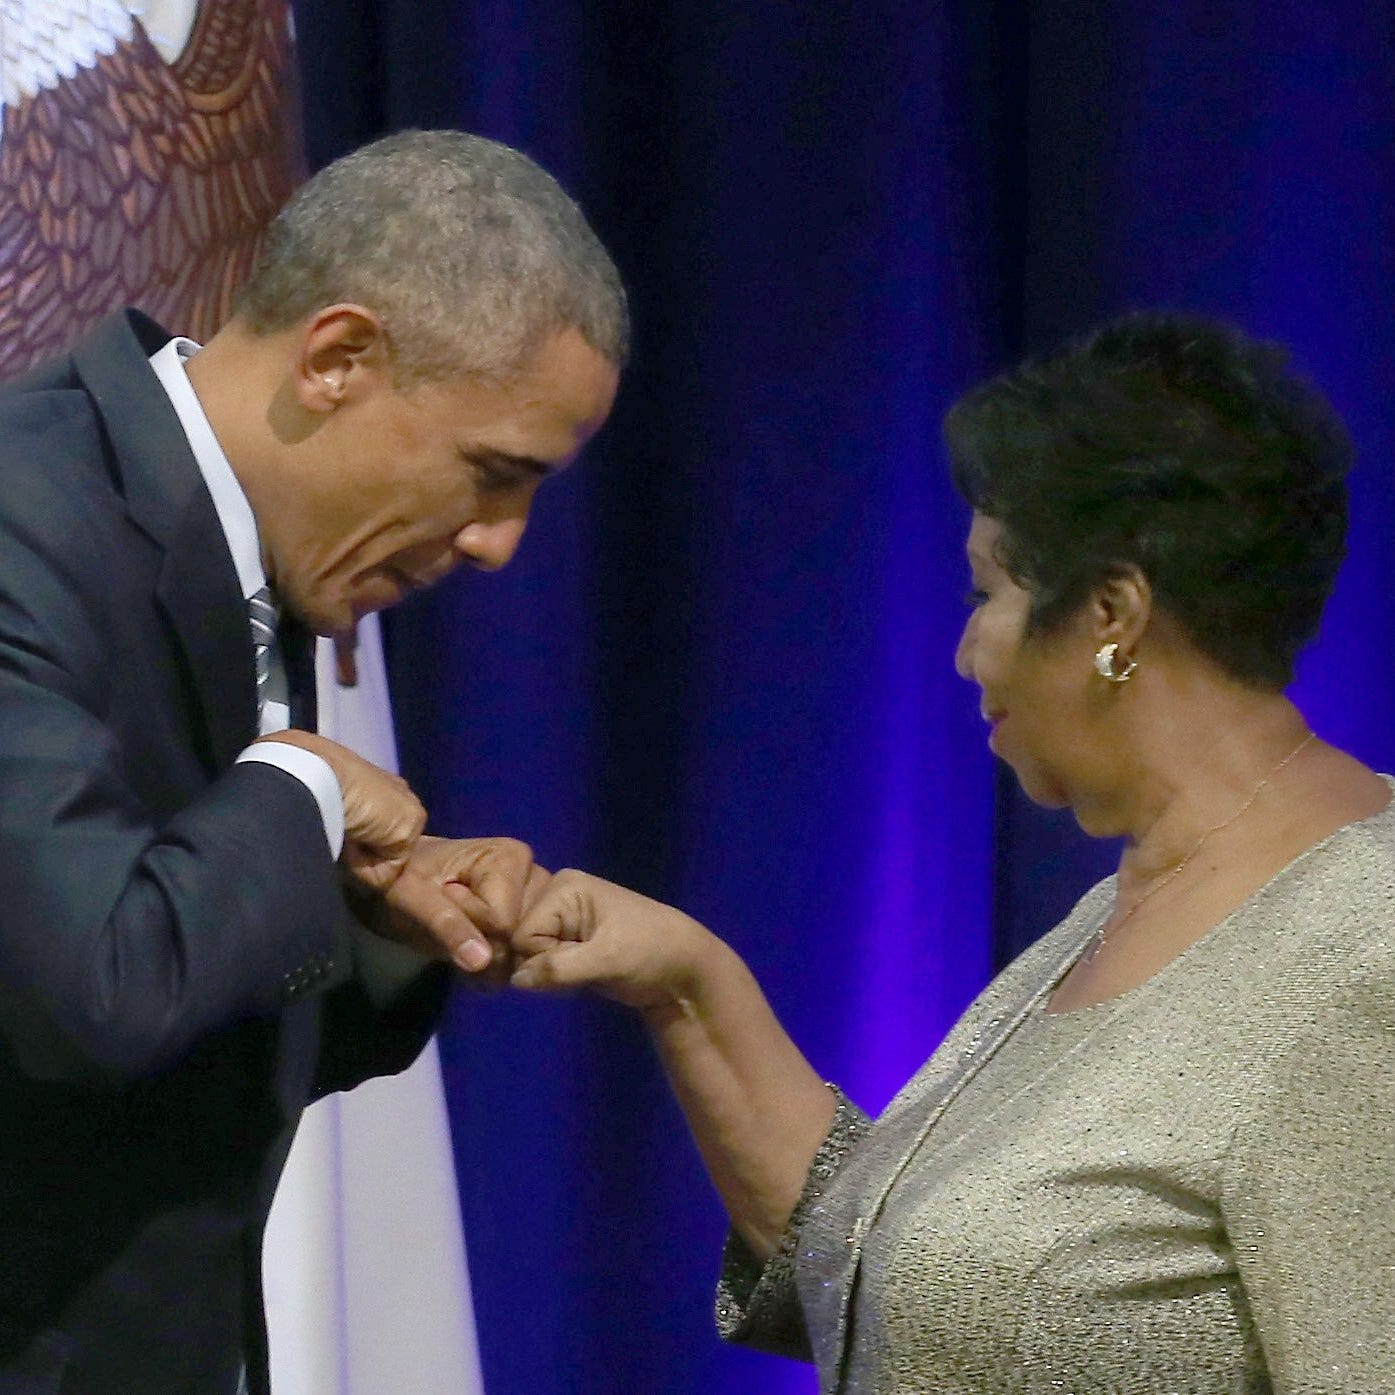 Barack Obama shares heartfelt message to Aretha Franklin